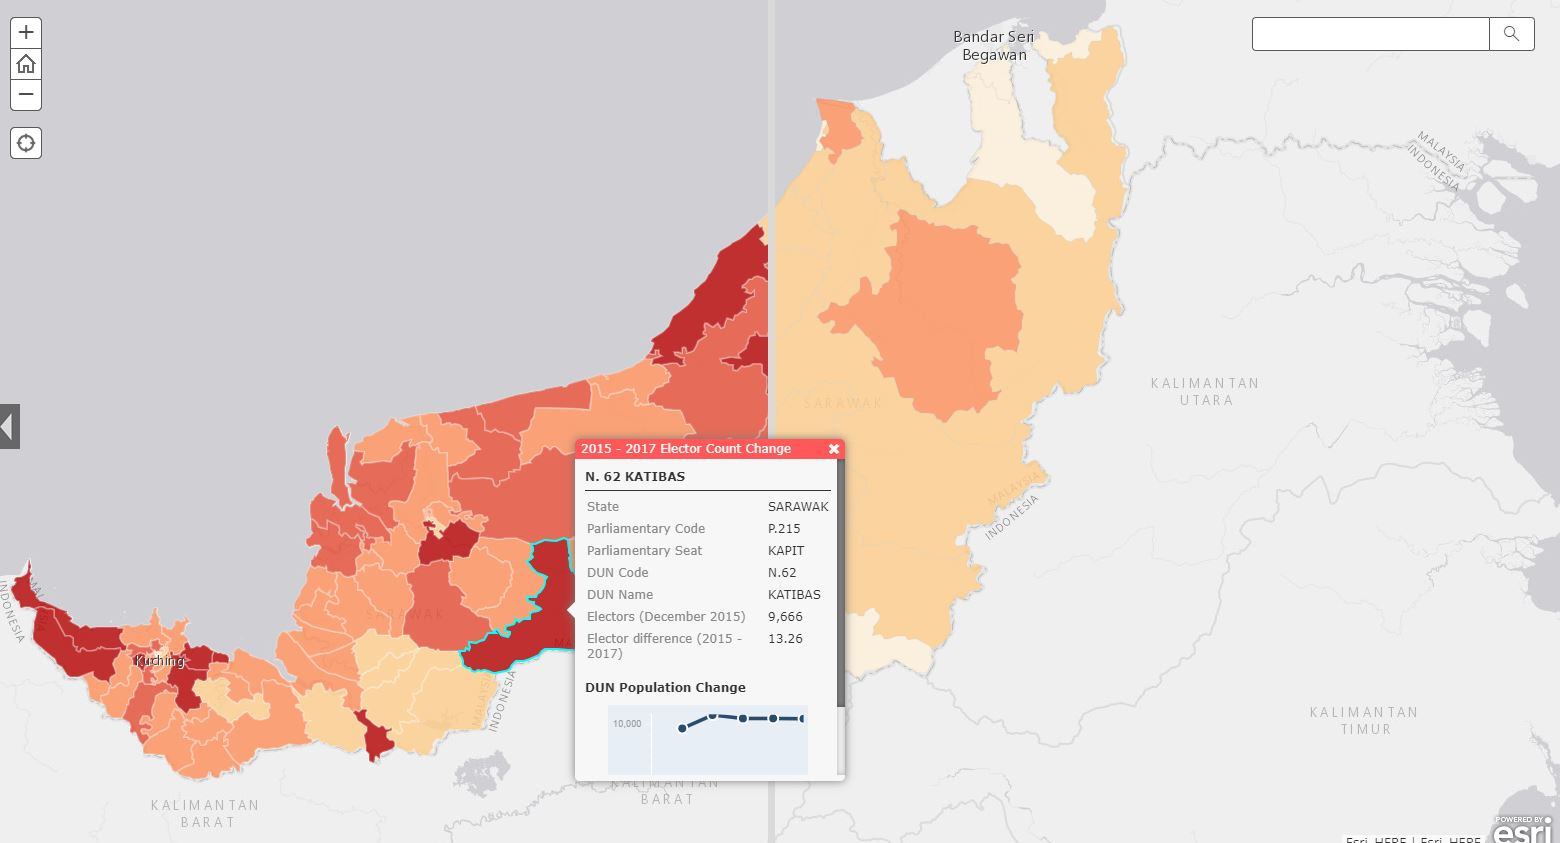 Evolution of Sarawak DUN Electorate Population